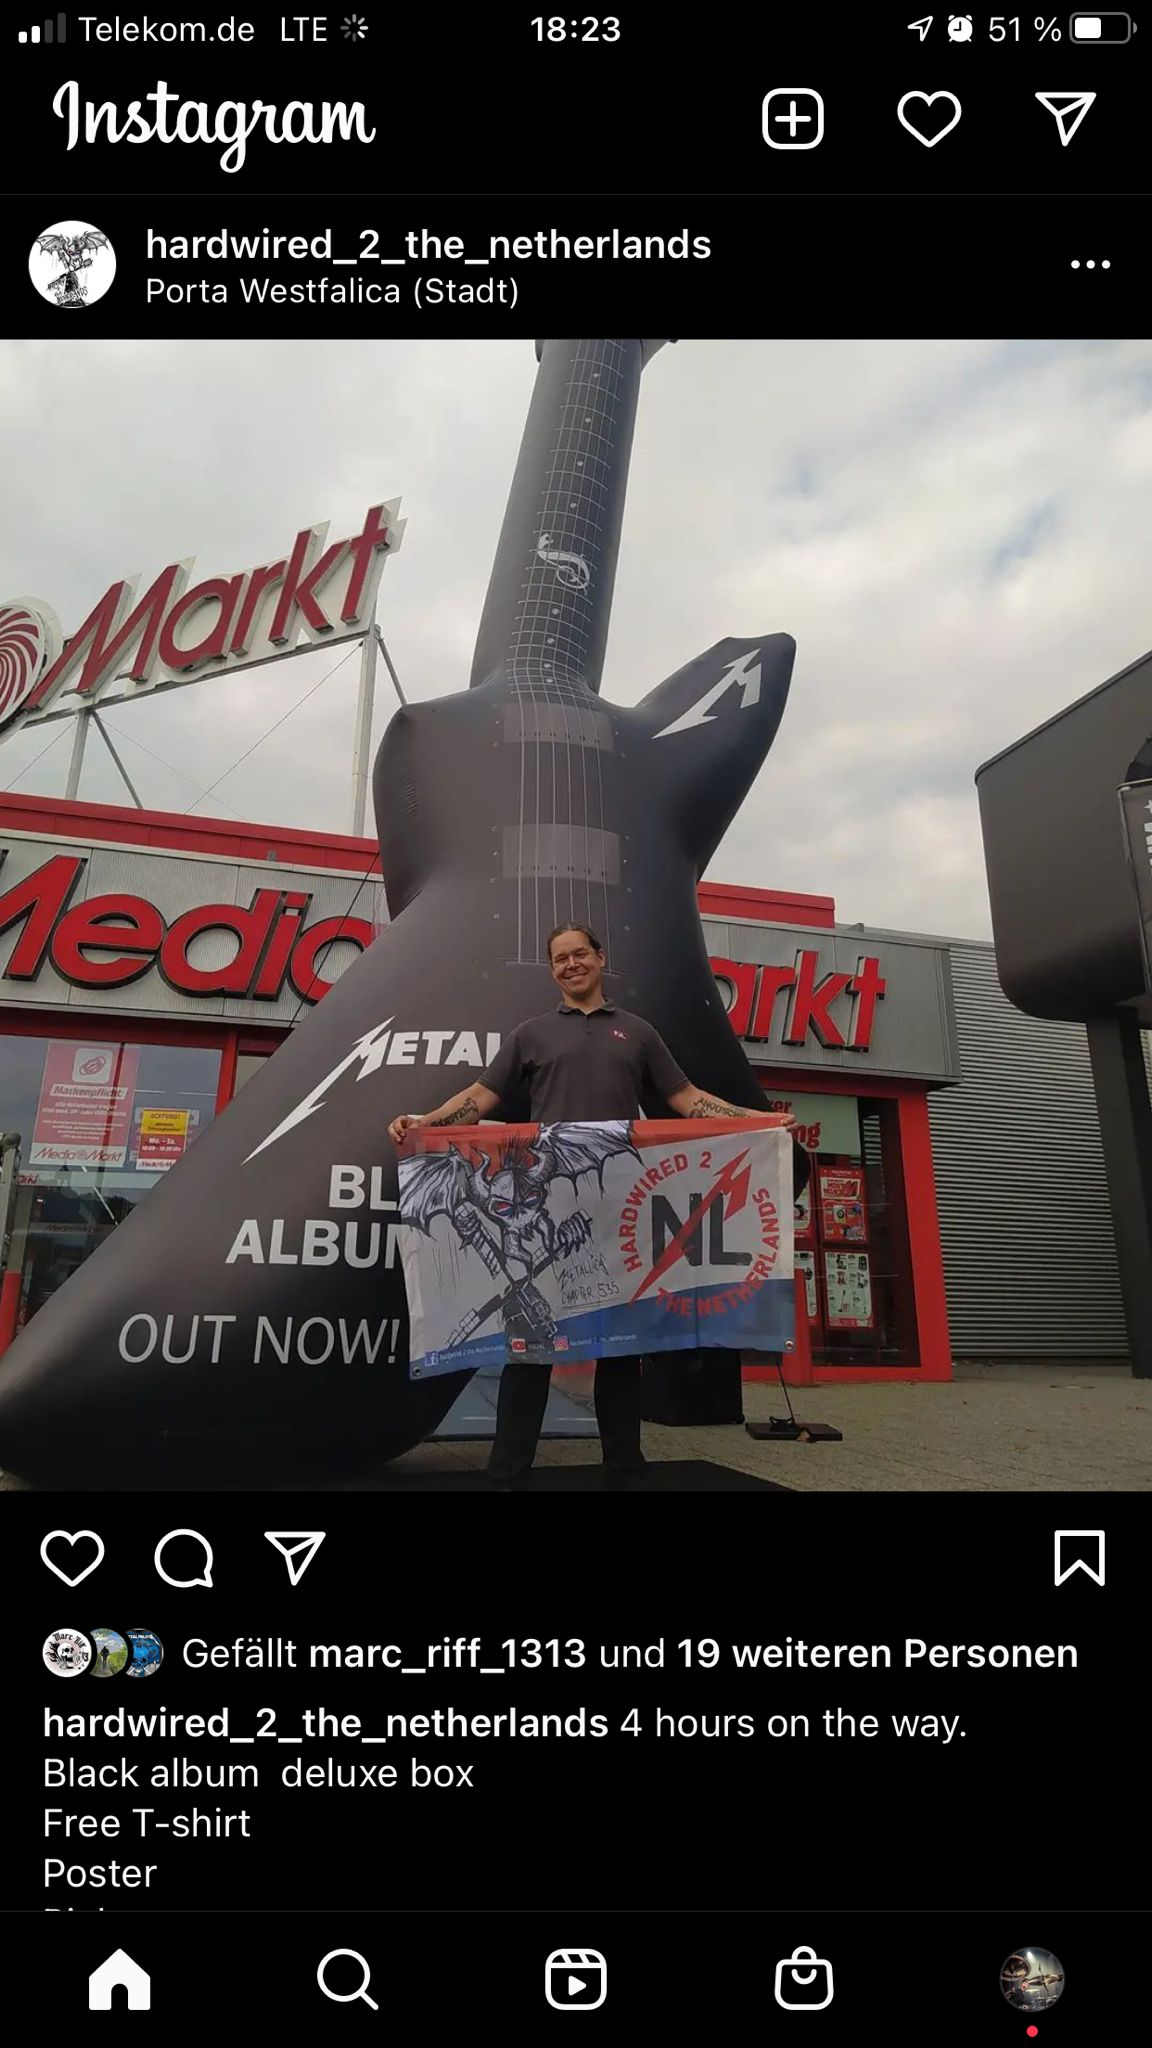 hardwired-netherlands-rens-bluemel-guitar-media-markt-porta-westfalica-2021-40th-anniversary